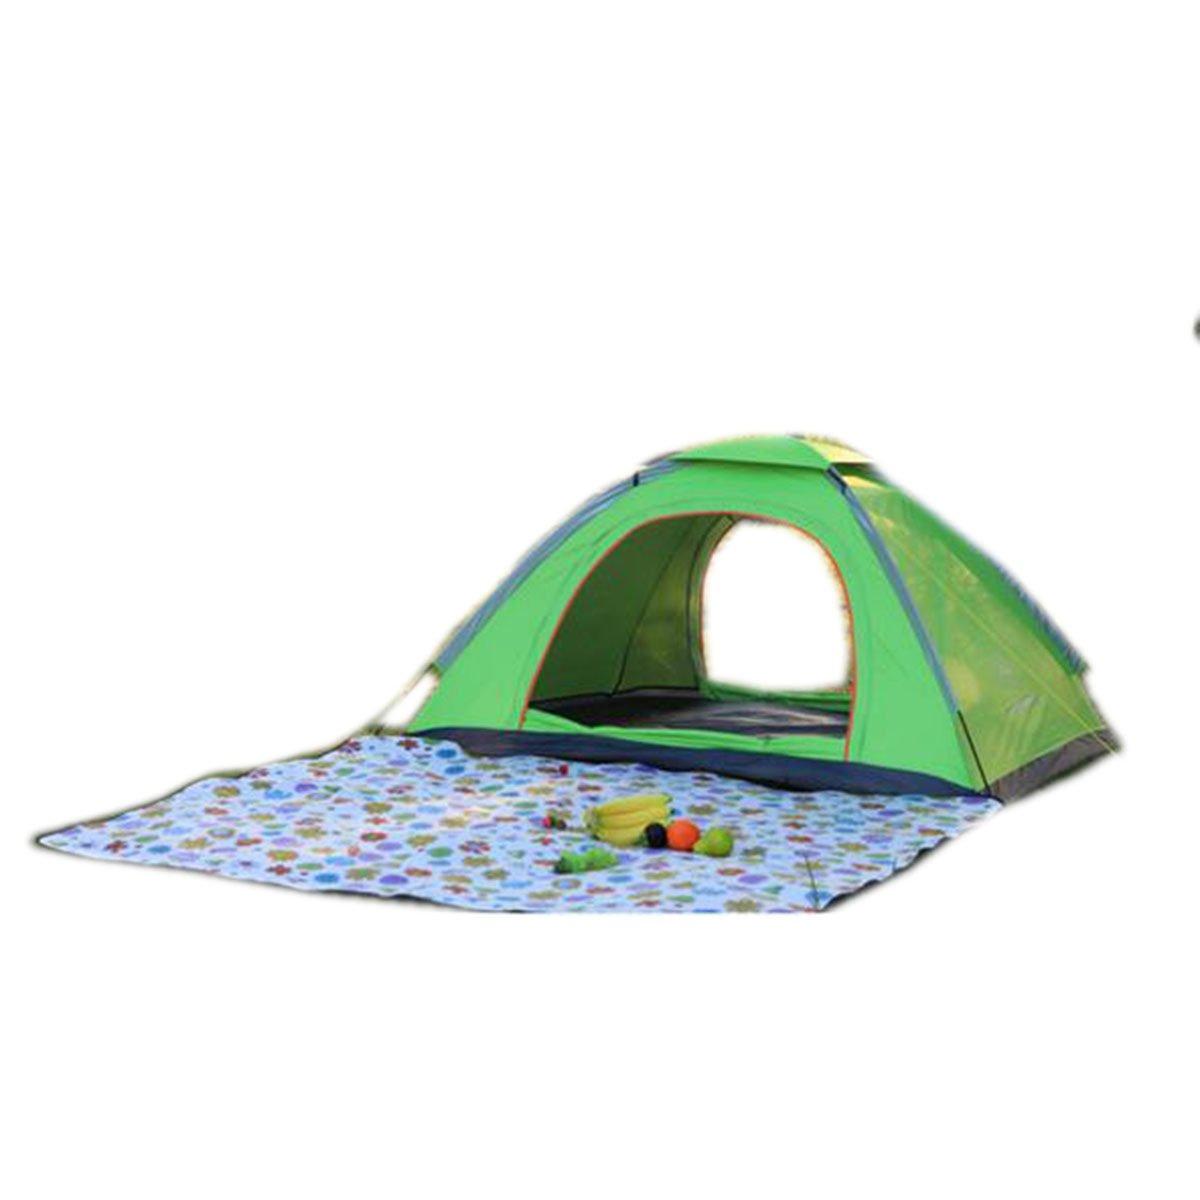 TZQ Freien Camping Camping Camouflage Bergsteigen Angeln Zelte,Grün